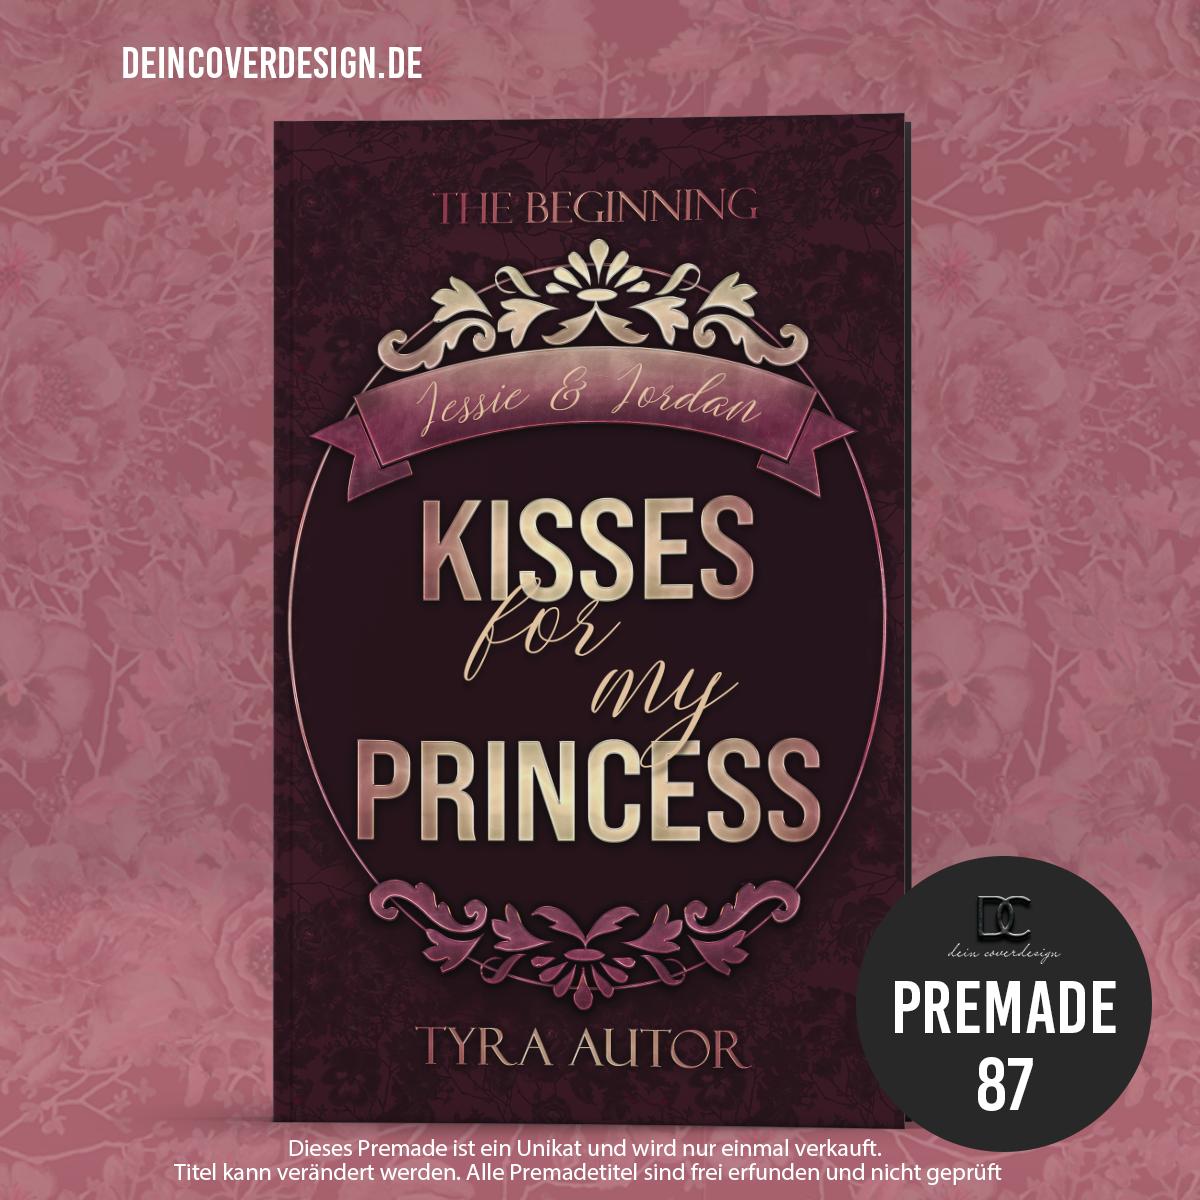 kisses for my princess